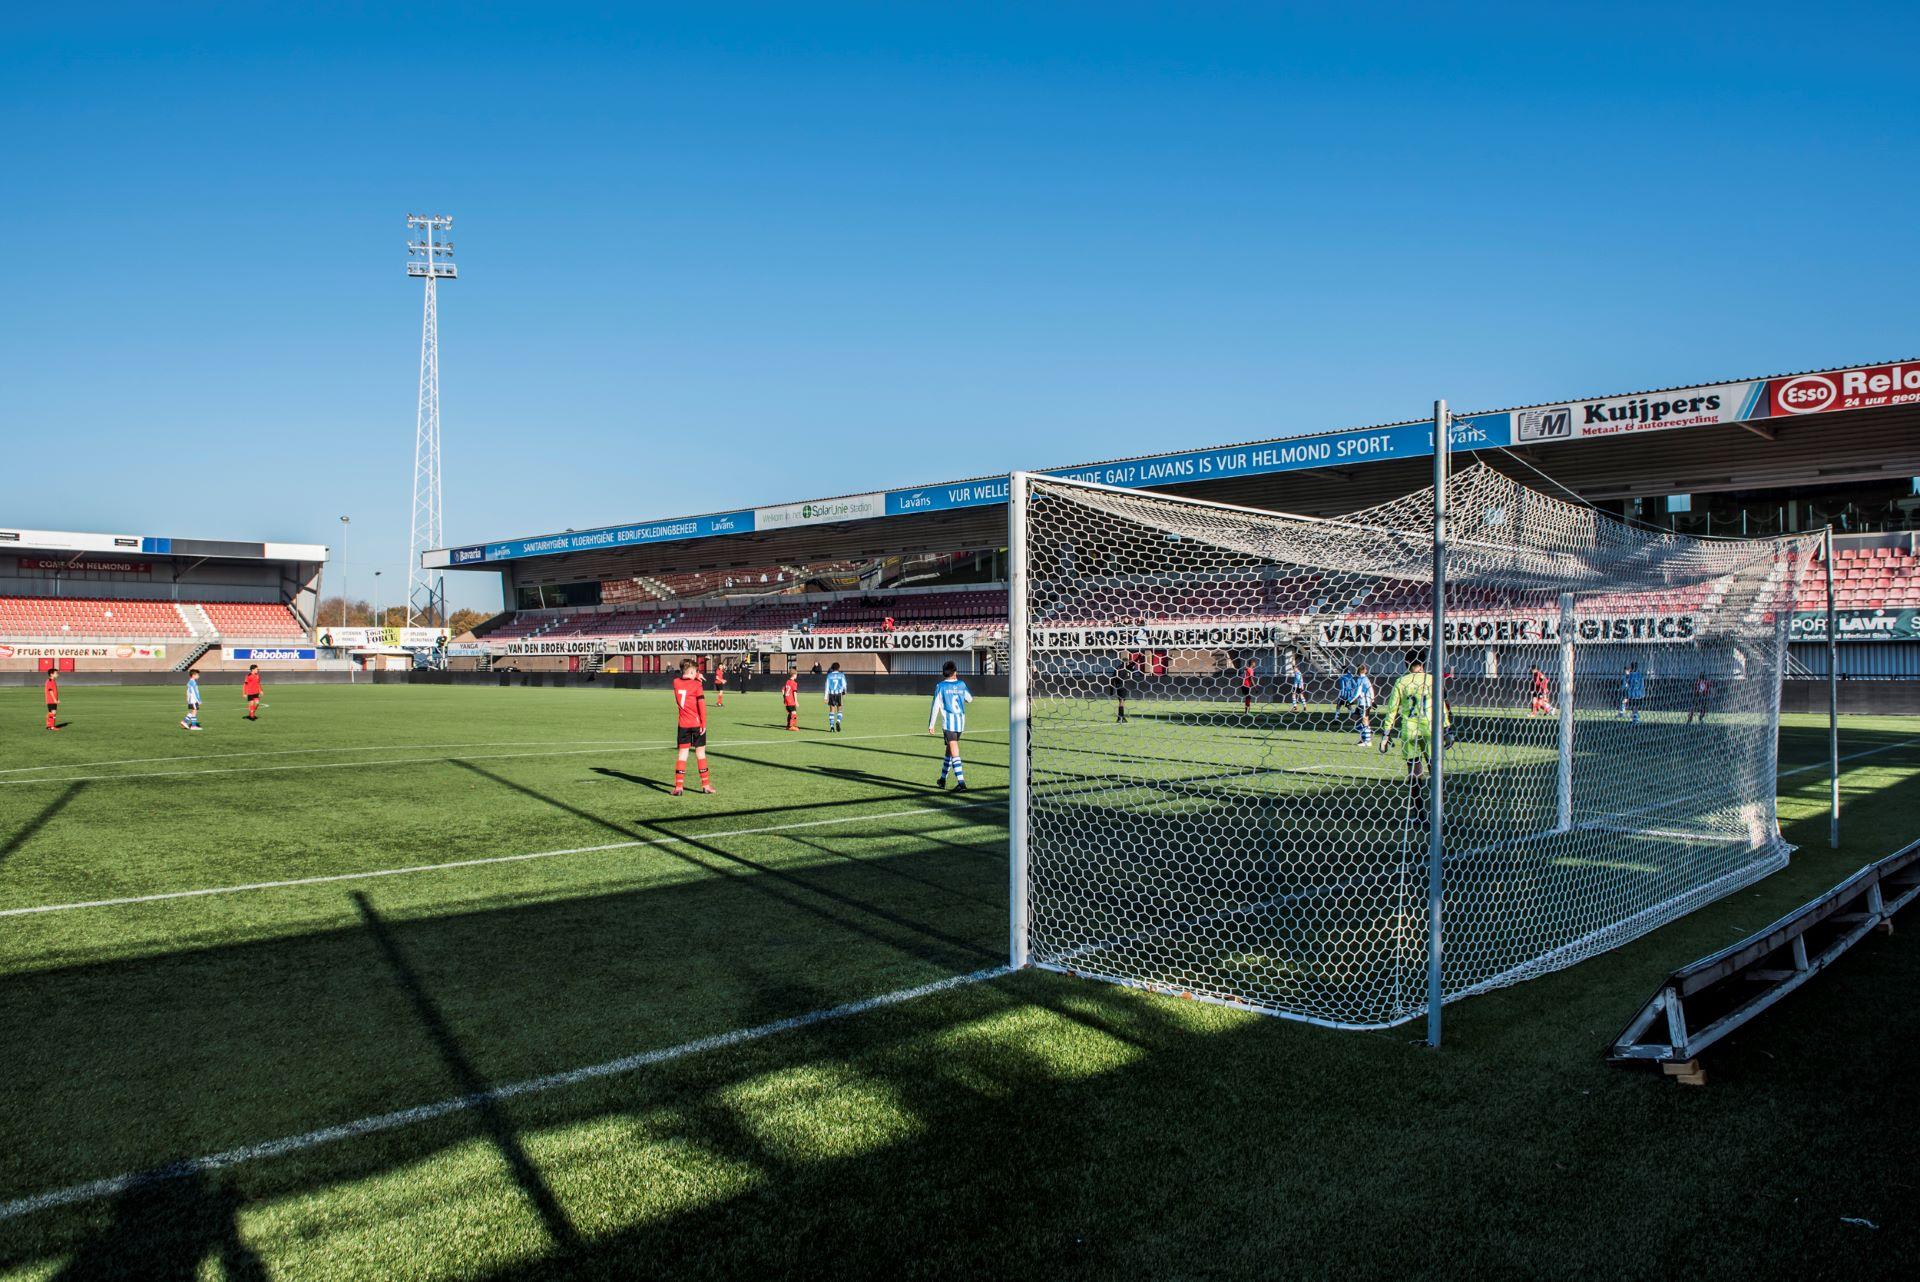 Overzichtsfoto voetbalwedstrijd Helmond Sport JO13 - Eindhoven JO13 in stadion